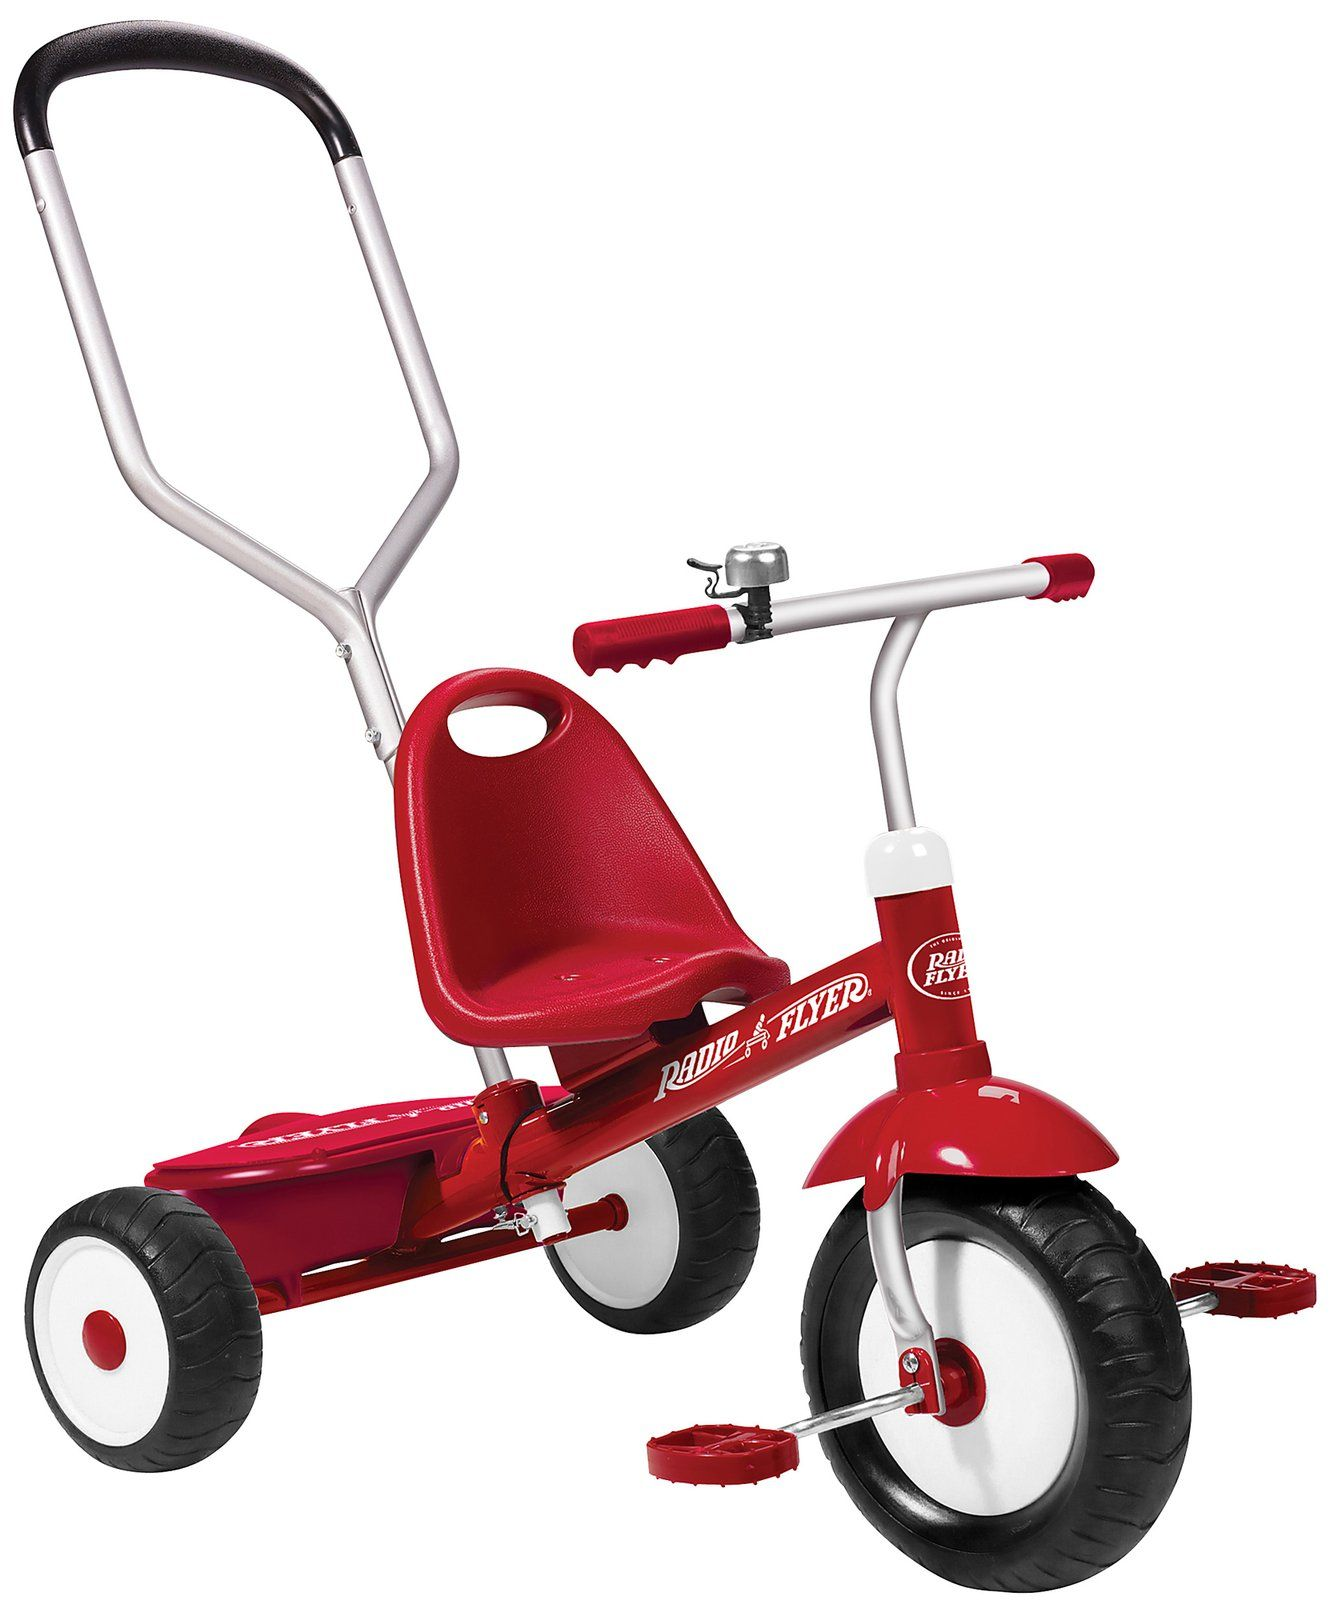 Radio Flyer Deluxe Steer & Stroll Trike Toddler tricycle